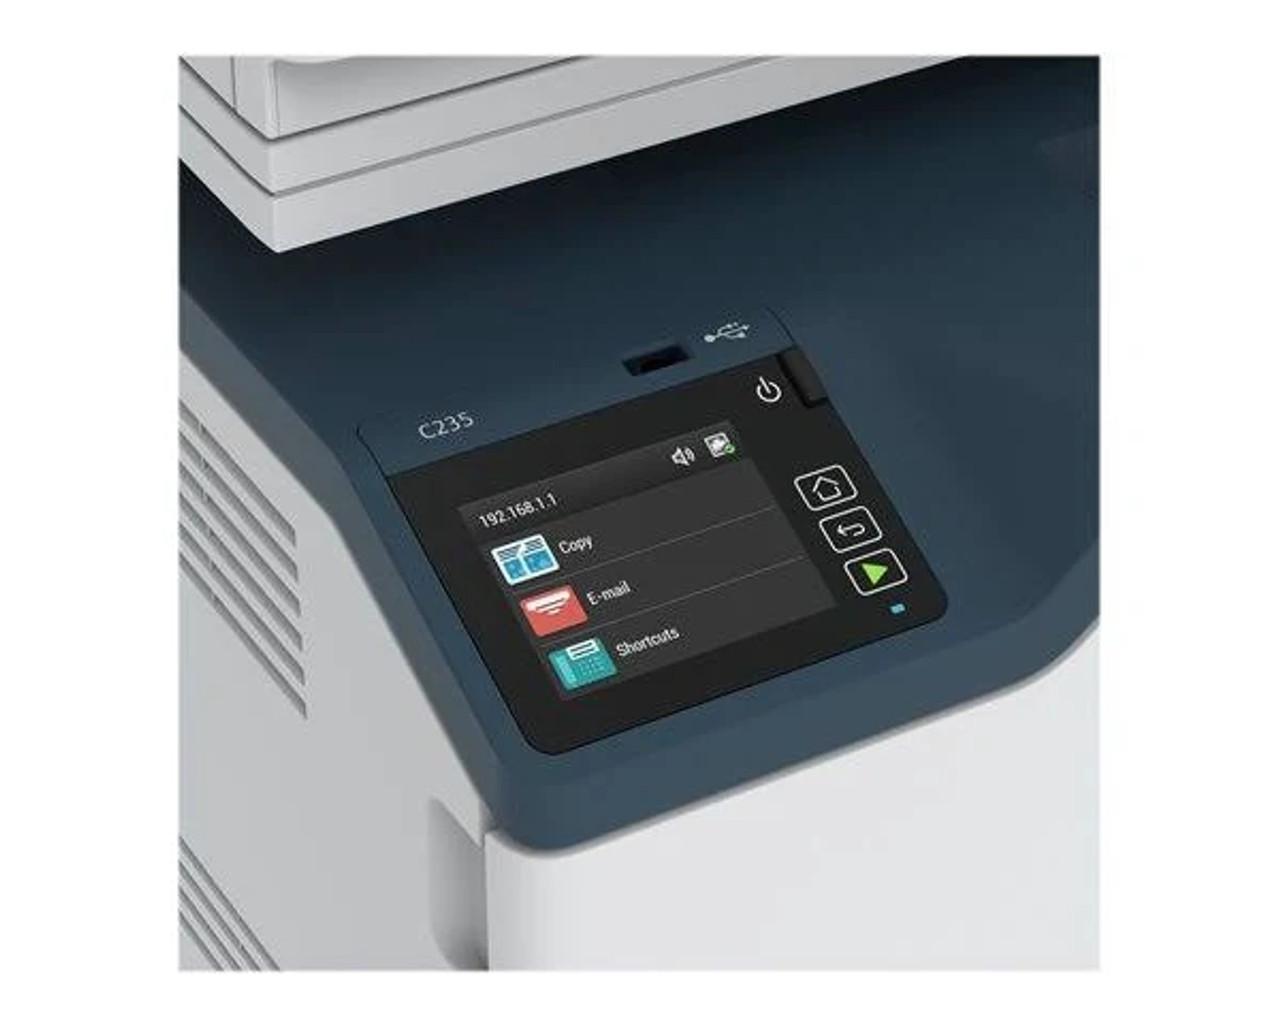 Xerox C235 Laser MFP Printer - Color MFP